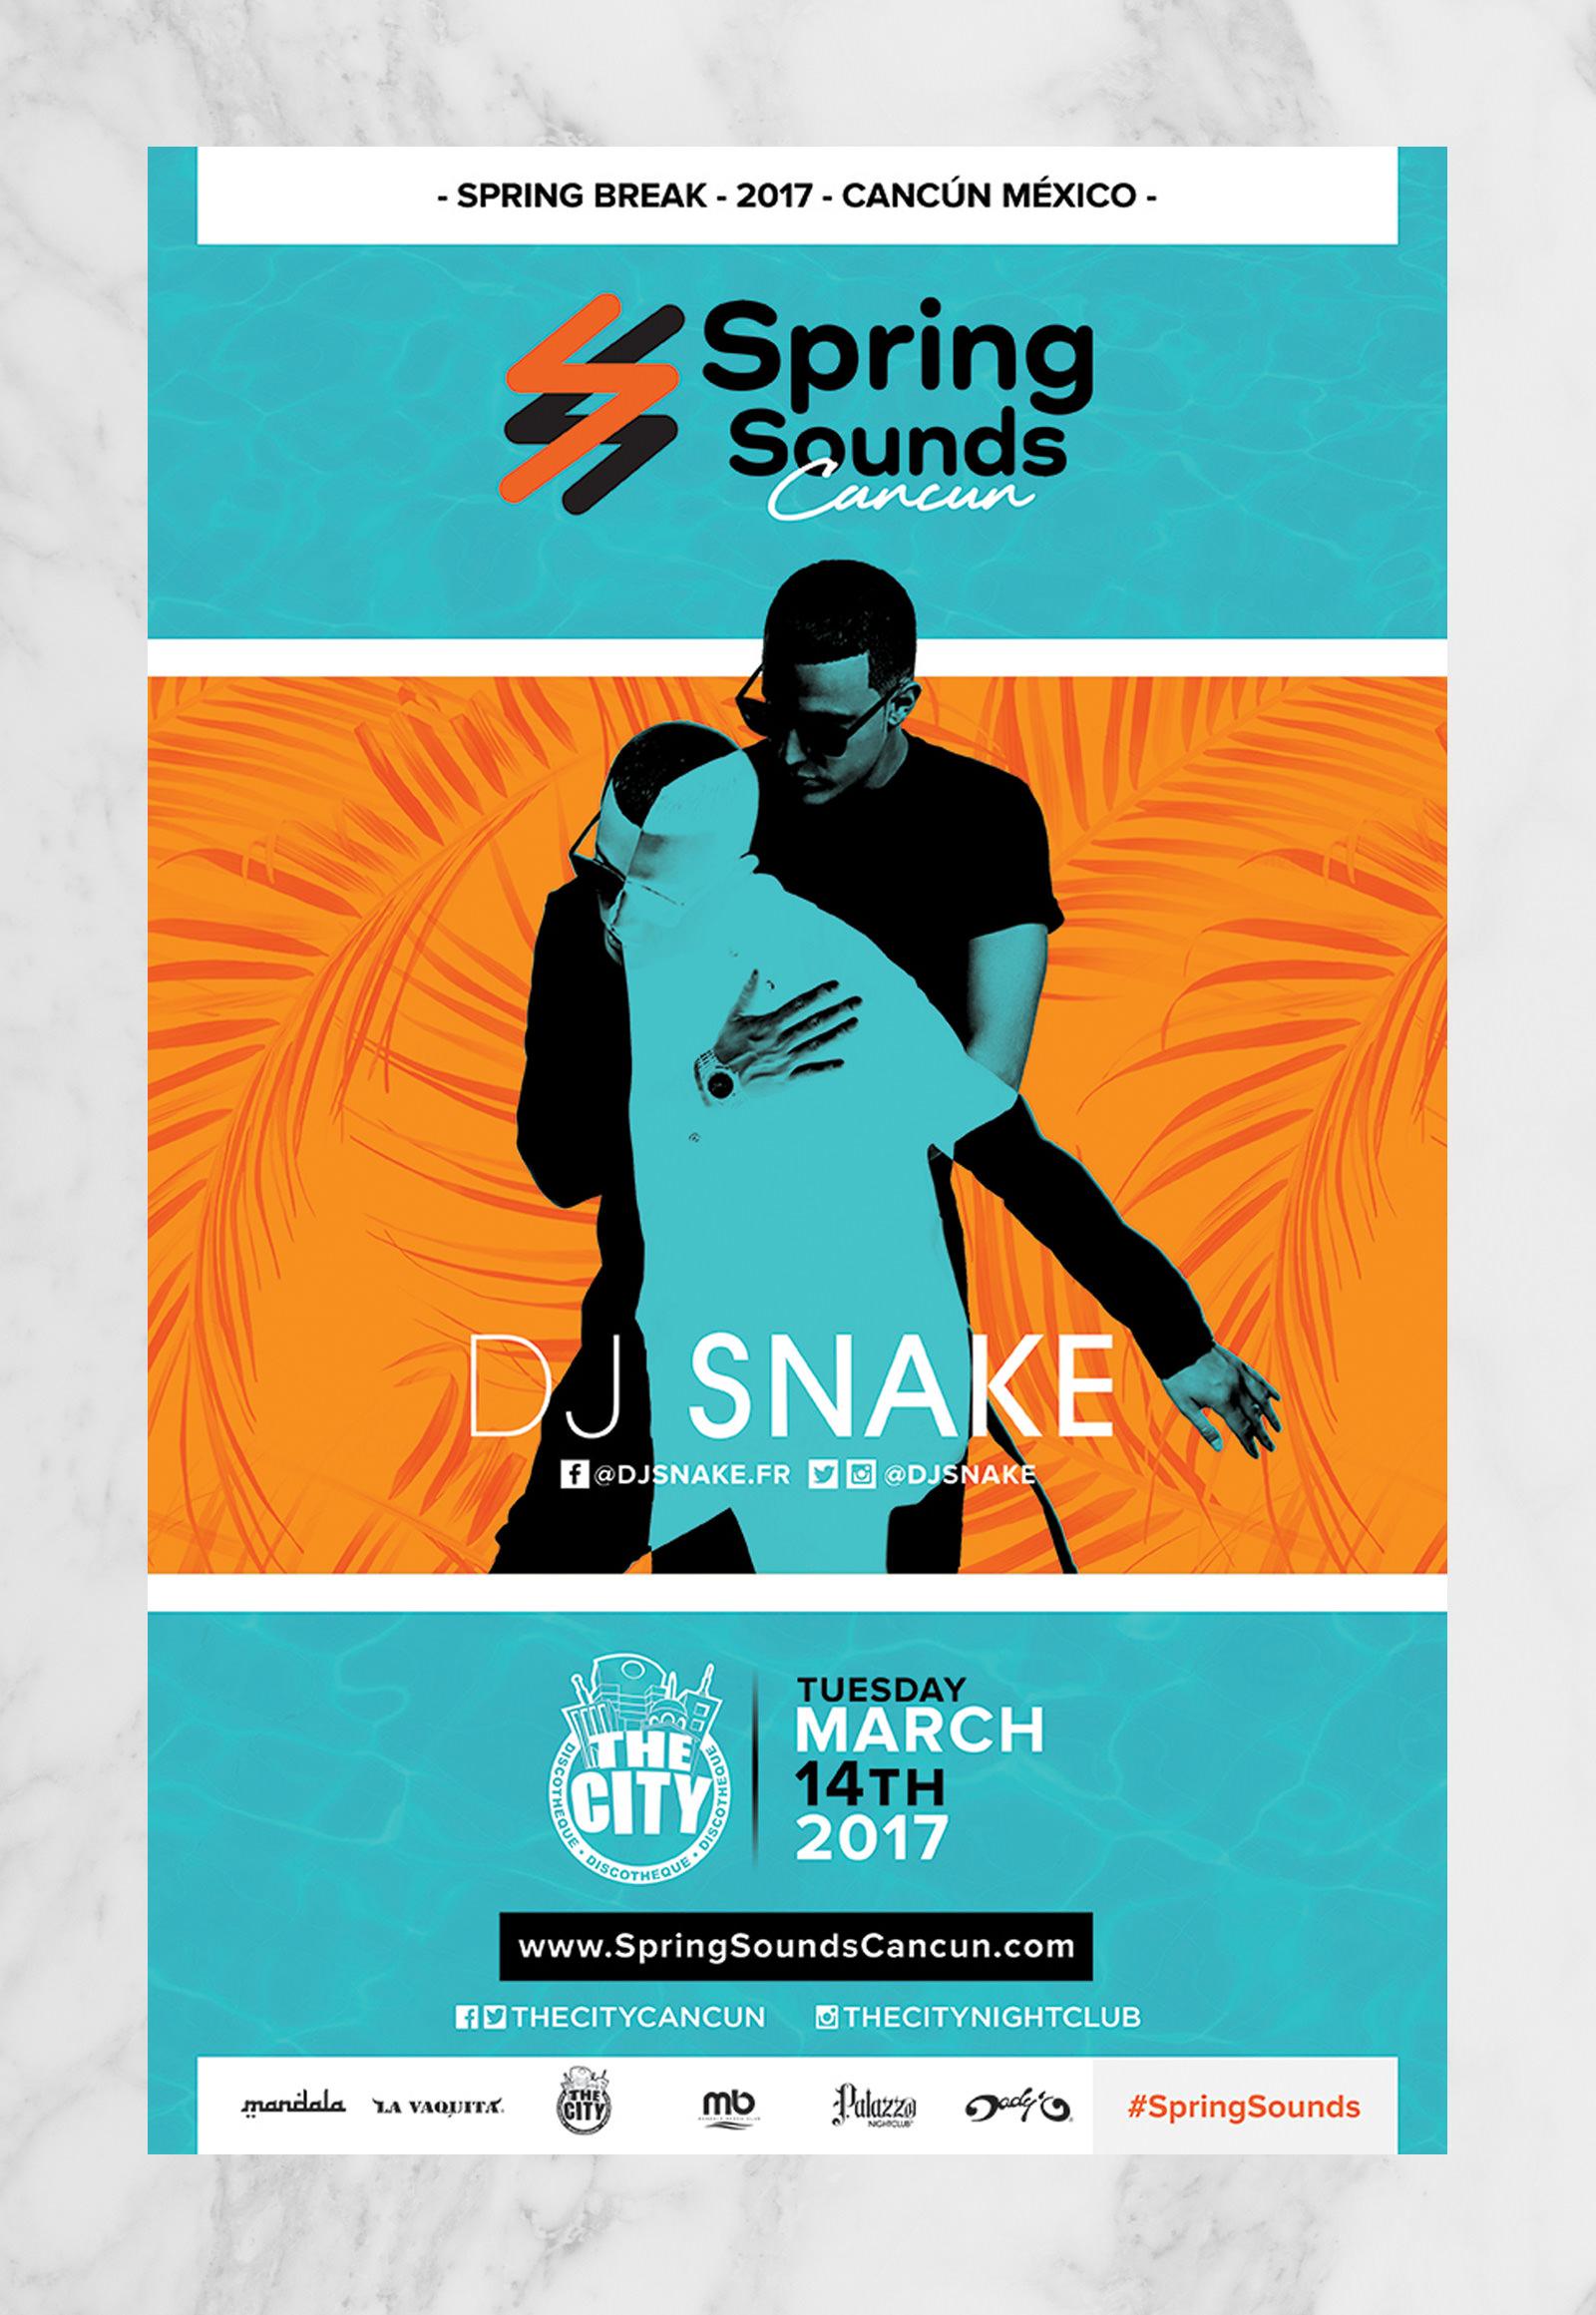 Spring Sounds Cancun Alex Lozada Creative Solutions